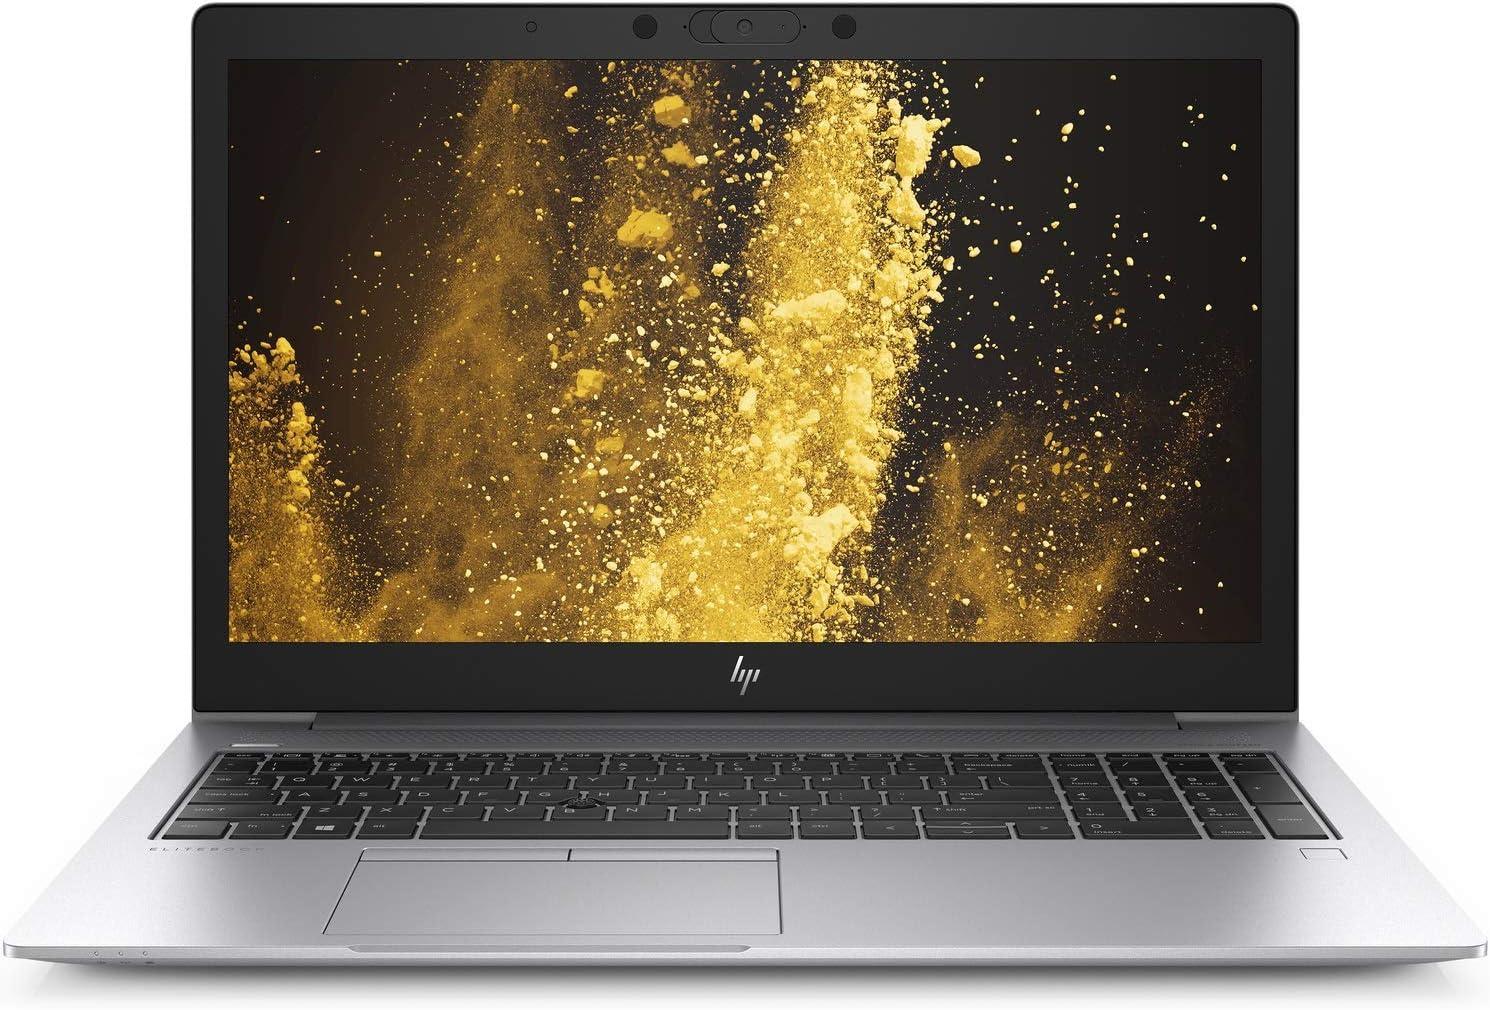 "2019 HP EliteBook 850 G6 15.6"" FHD Business Laptop Computer: 8th Gen Intel Quard-Core i7 8565U up to 4.6GHz/ 8GB DDR4 RAM/ 512GB PCIe SSD/ 802.11ac WiFi/ Bluetooth 4.2/ USB-C/ Windows 10 Professional"